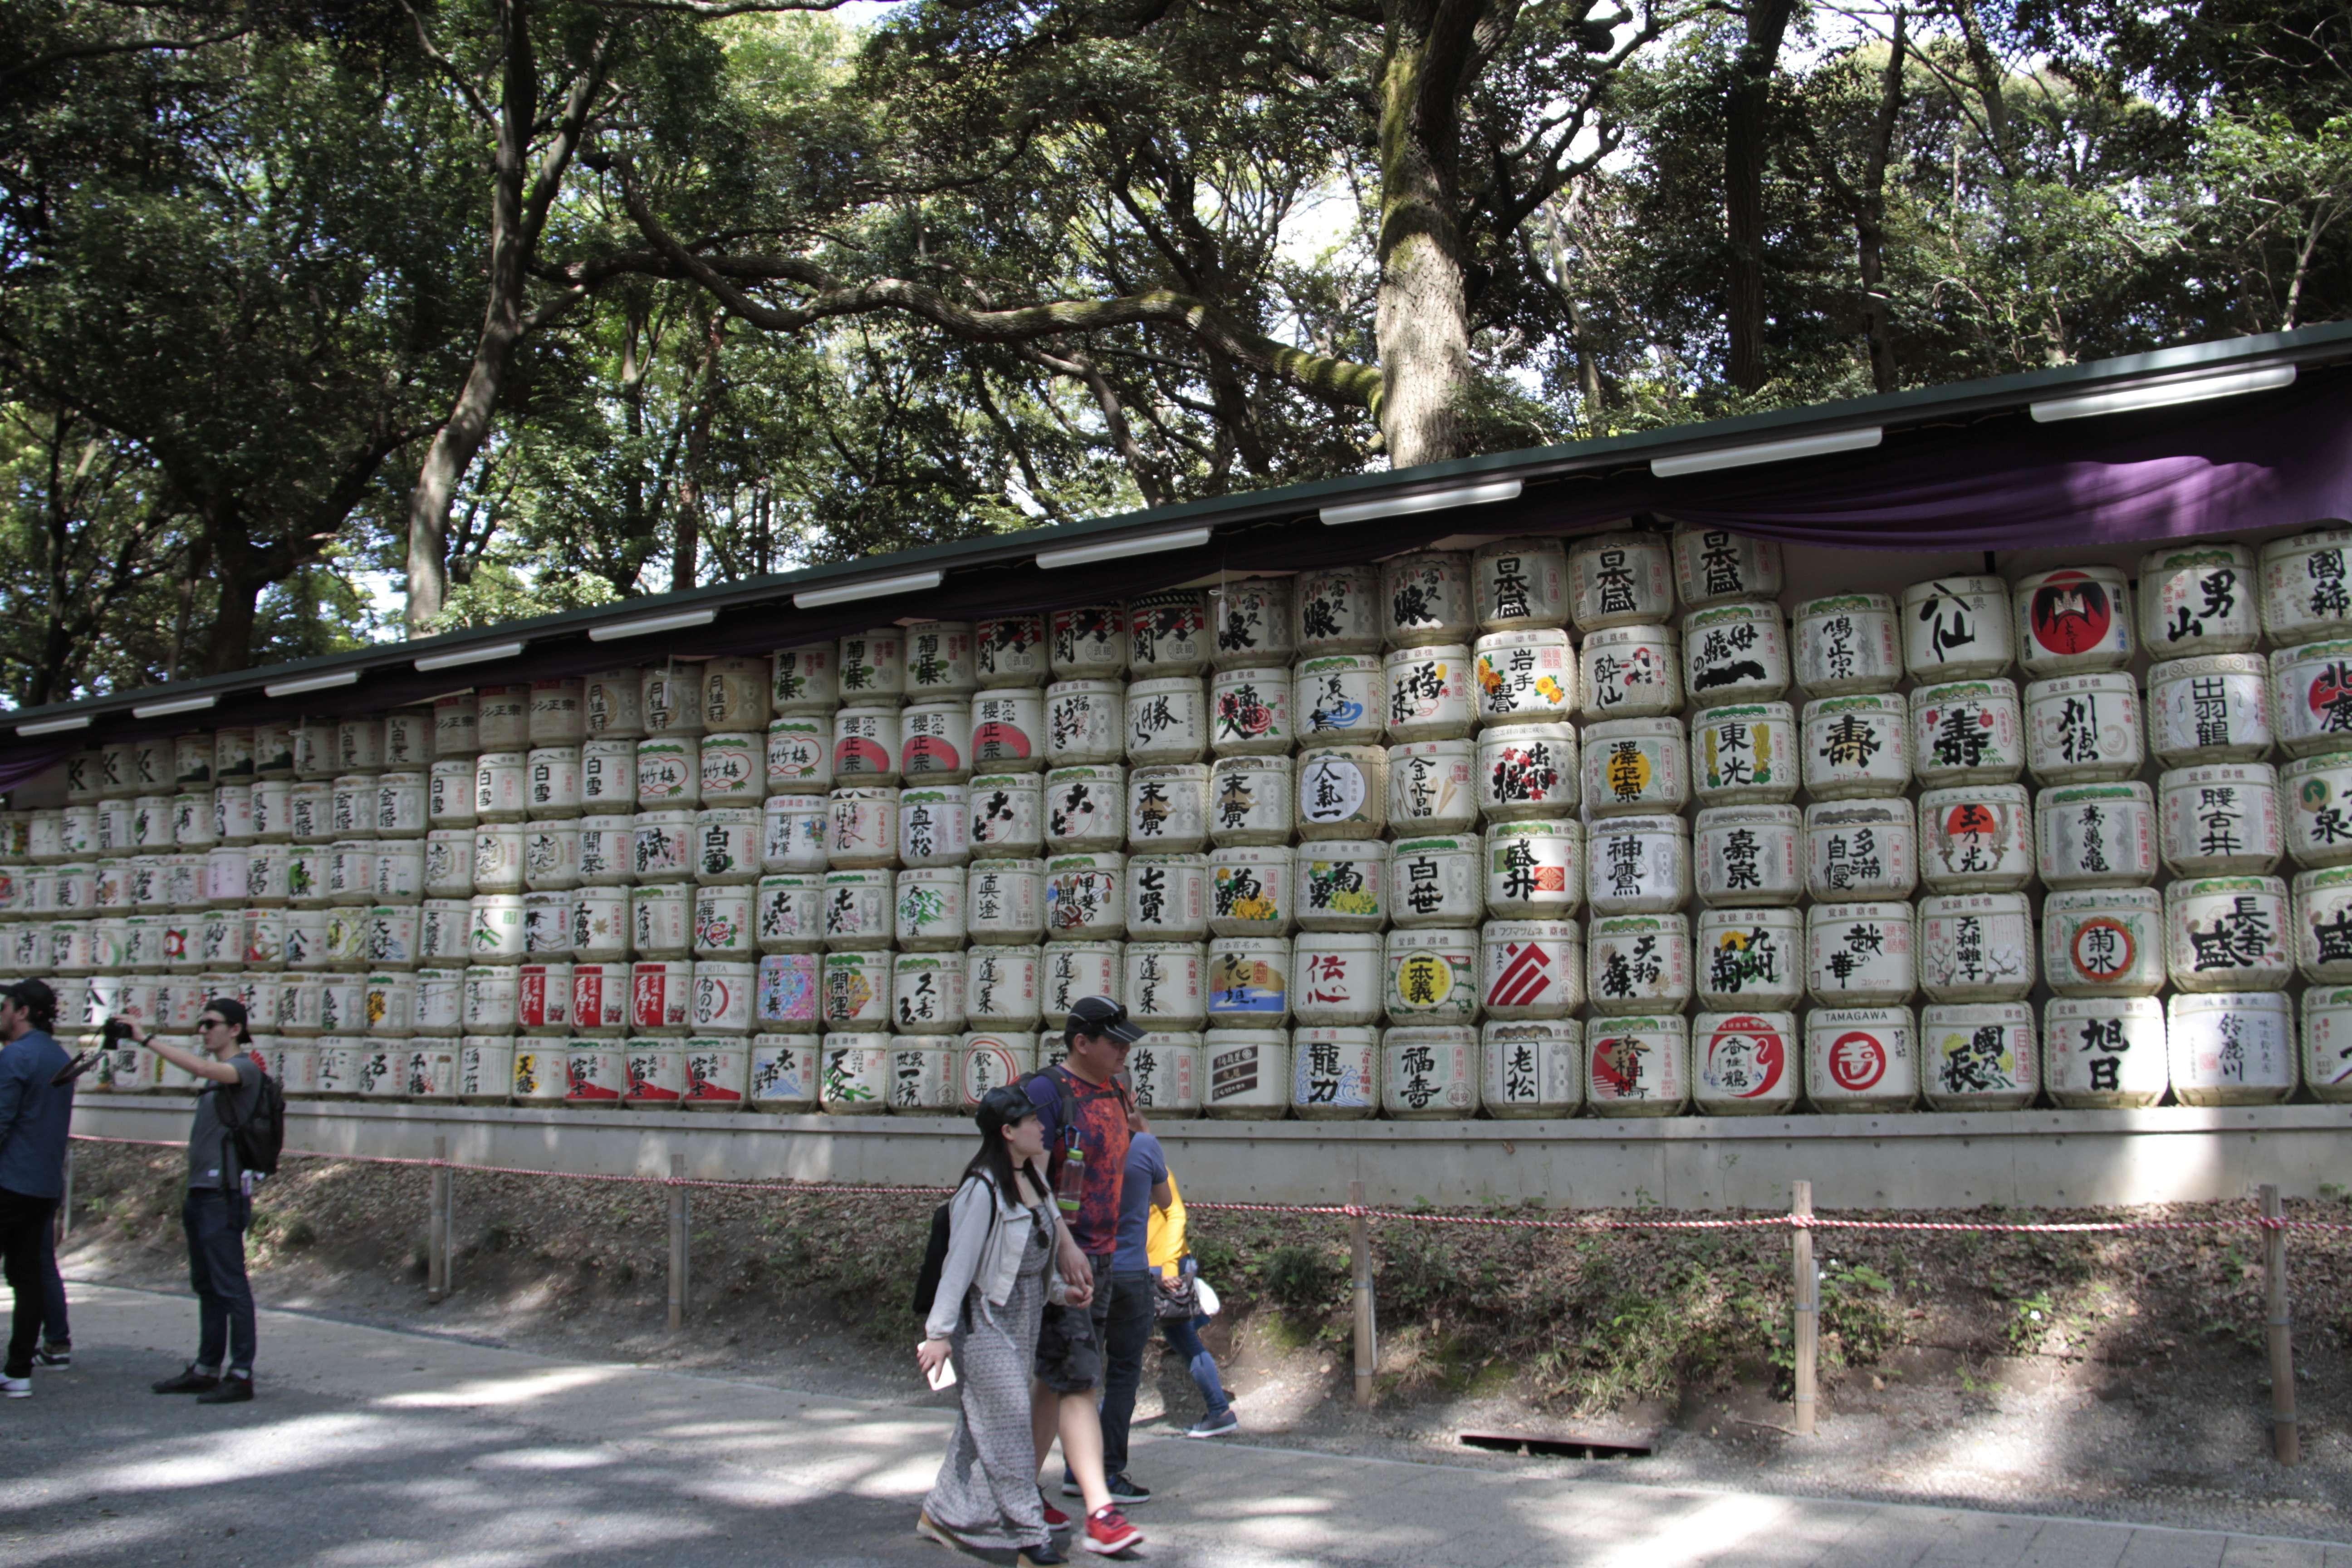 Japon avril 2017_0220 Tokyo Yoyogo Park et Meiji Jingu